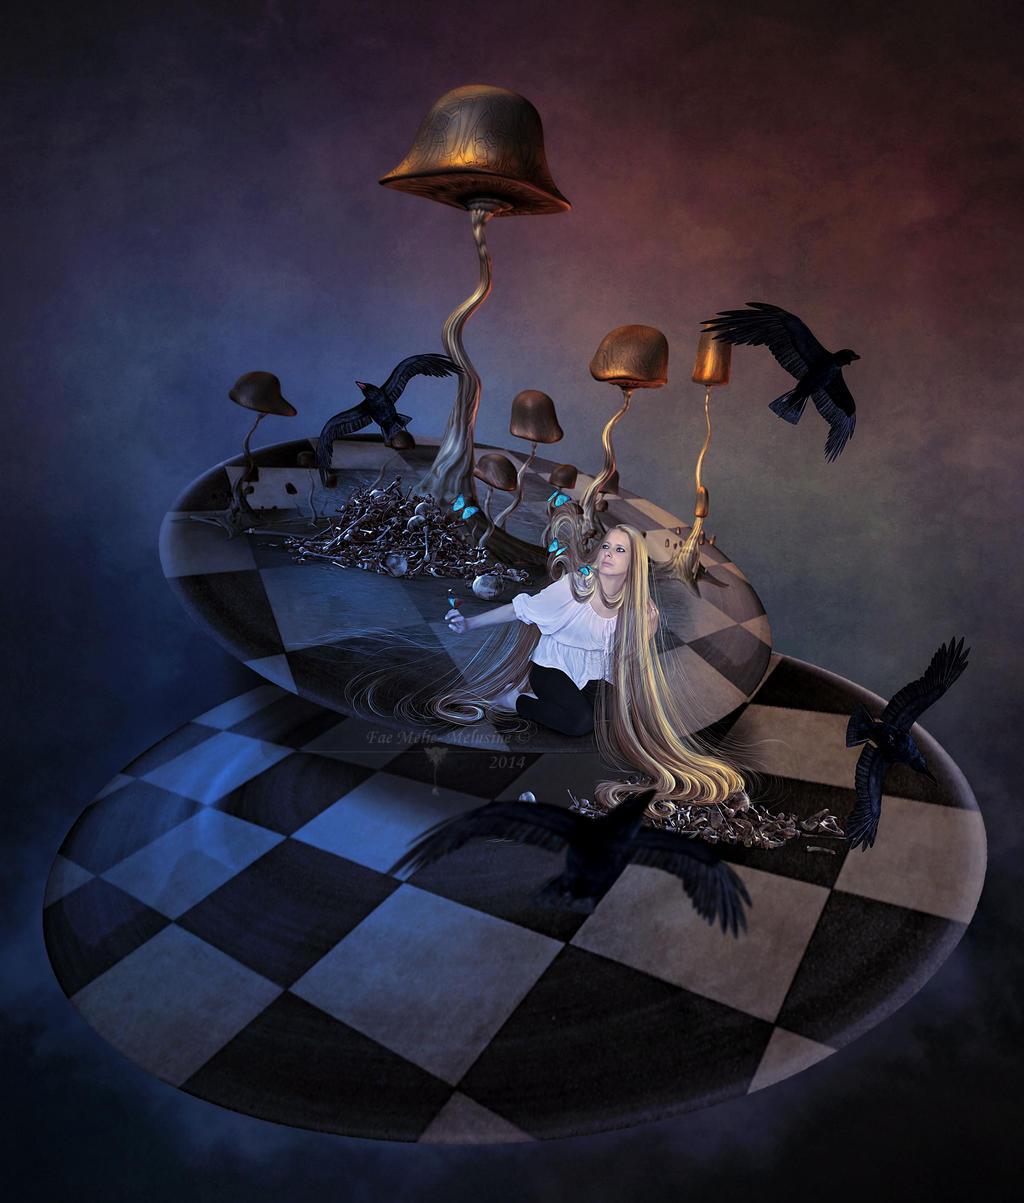 Lost In Nightmare by MelieMelusine